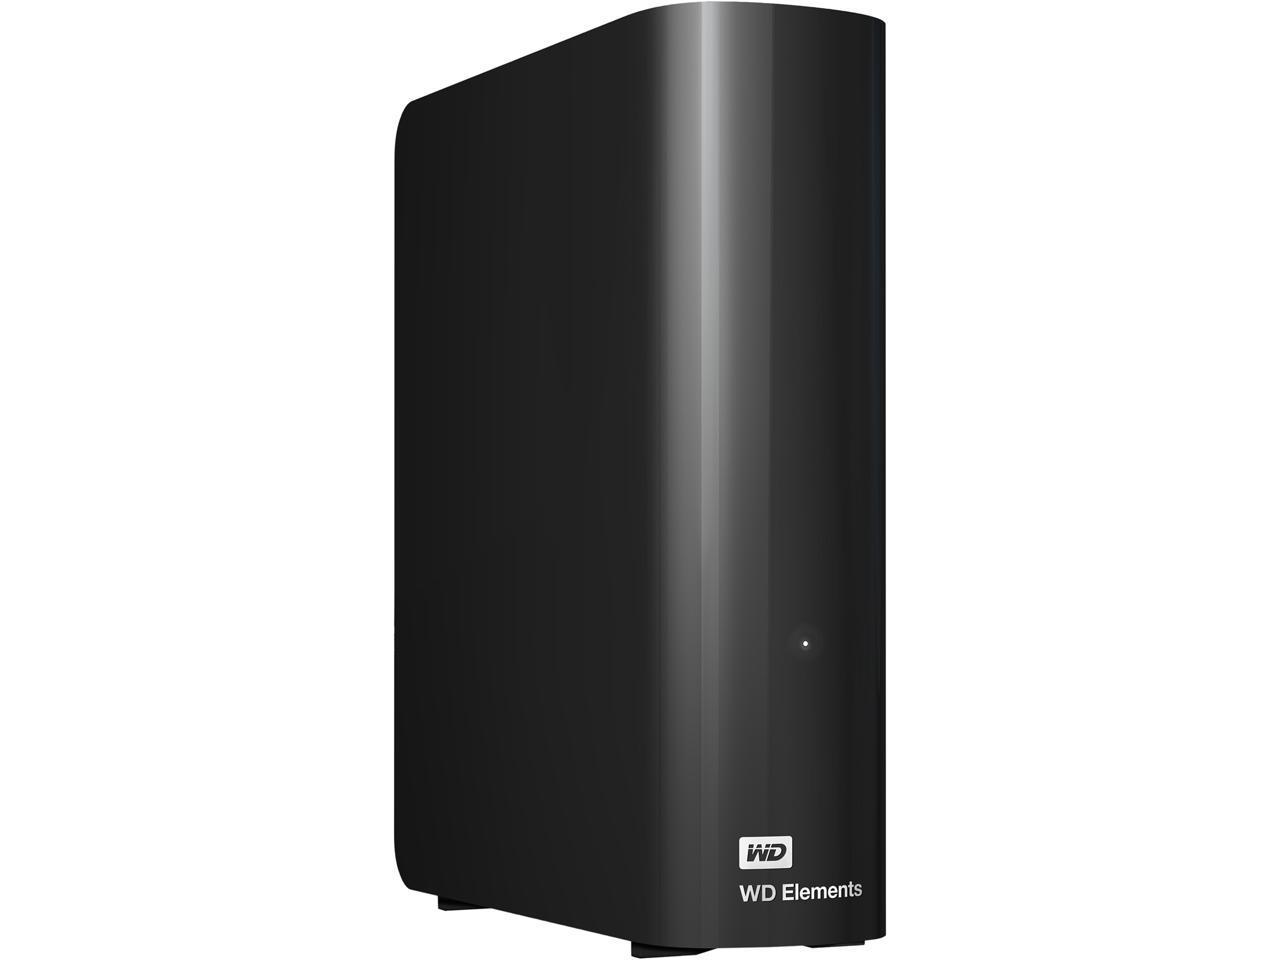 WD Elements 8TB USB 3.0 Desktop Hard Drive WDBWLG0080HBK-NESN $132.99 Free S/H Limit 5